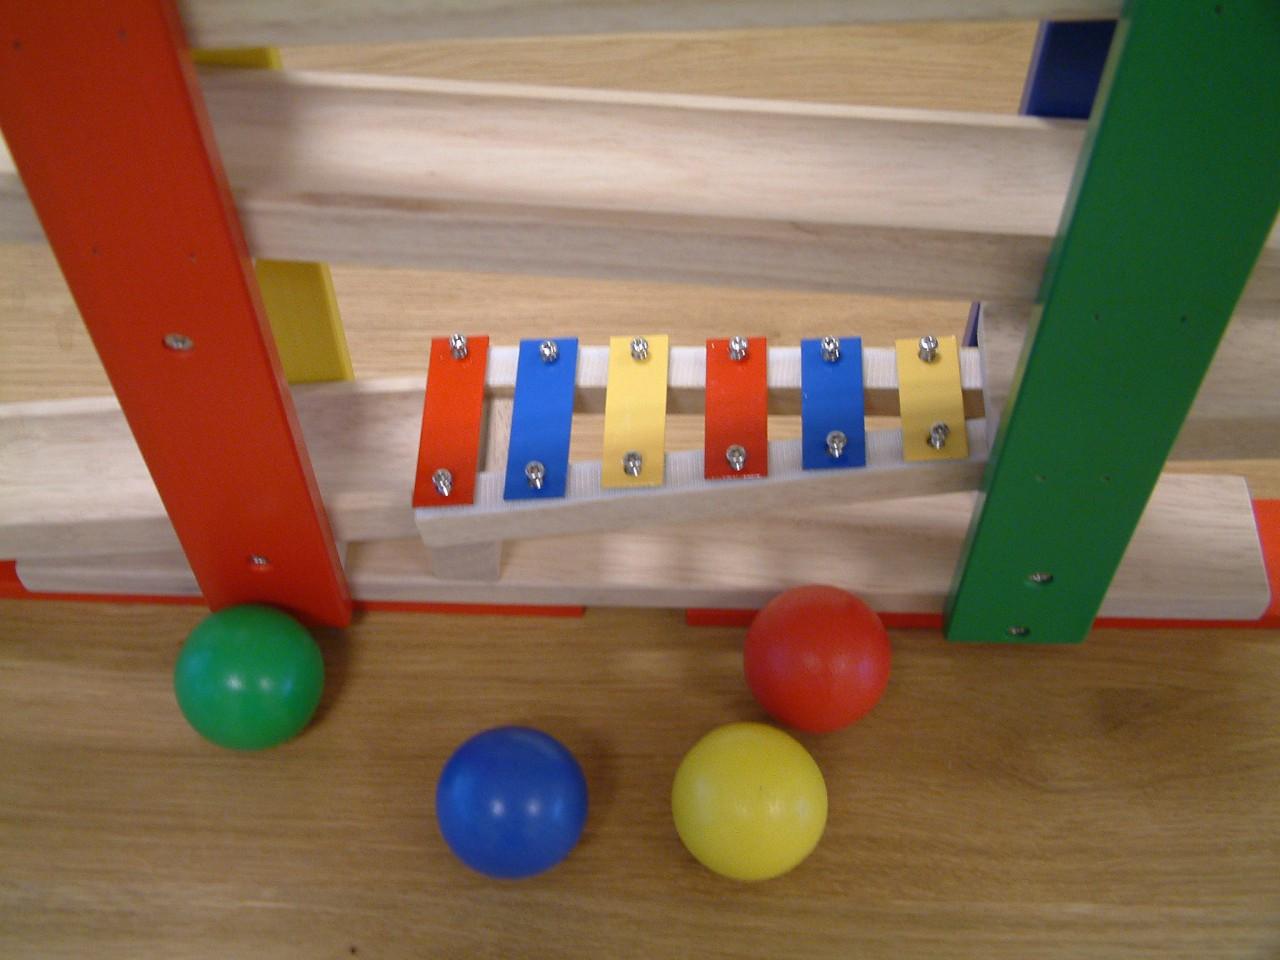 holz-kugelbahn mit xylophon + 4 kugeln (45 mm) holzbahn murmelbahn, Moderne